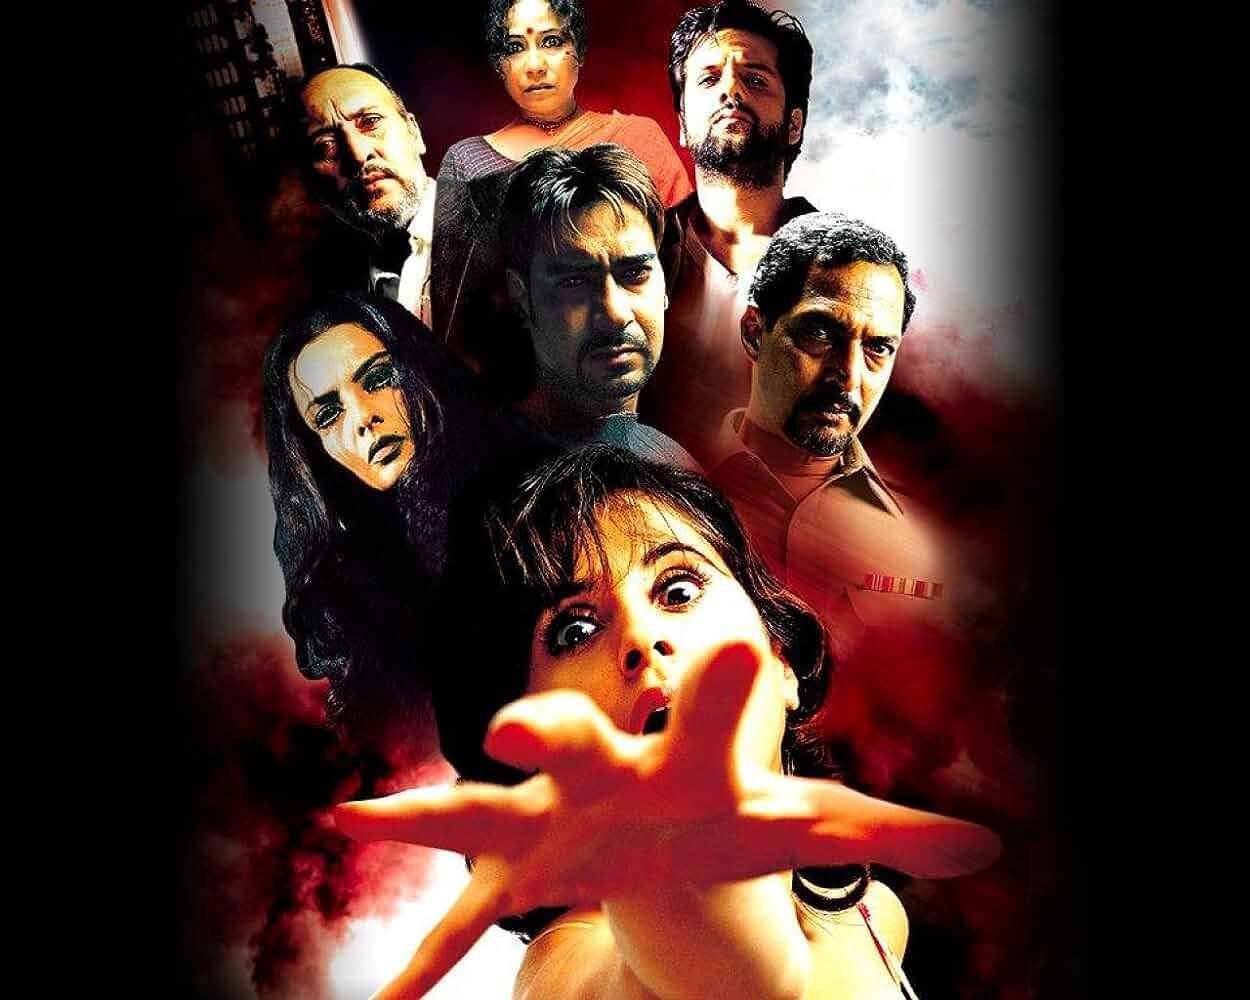 Bhoot 2003 Hindi Movie 720p HDRip full movie watch online freee download at movies365.ws